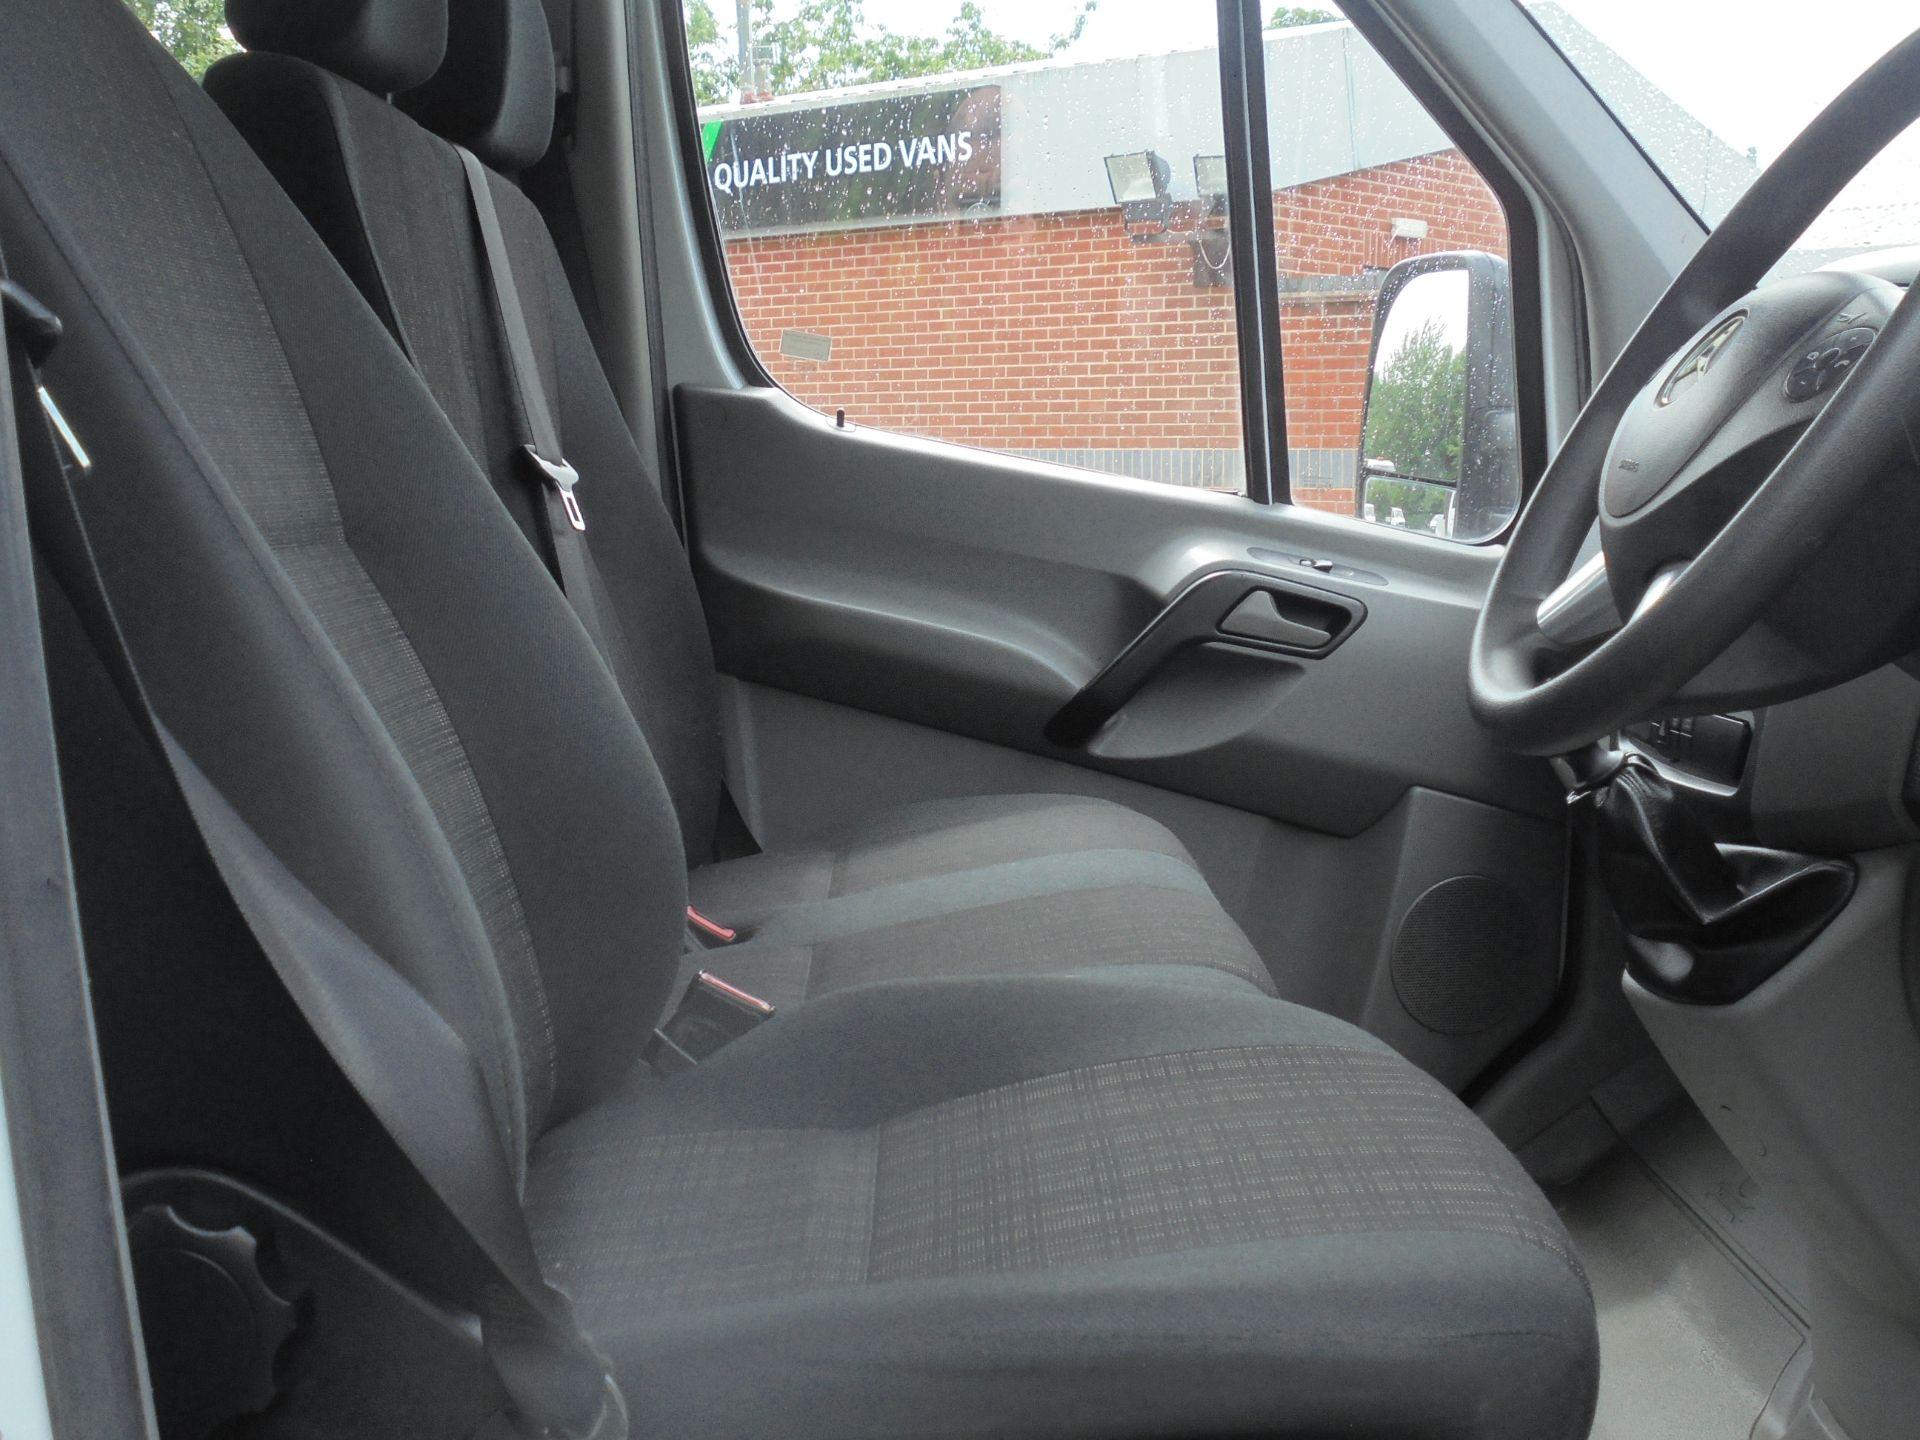 2017 Mercedes-Benz Sprinter 3.5T Crew Cab TIPPER (KM17FNU) Image 12